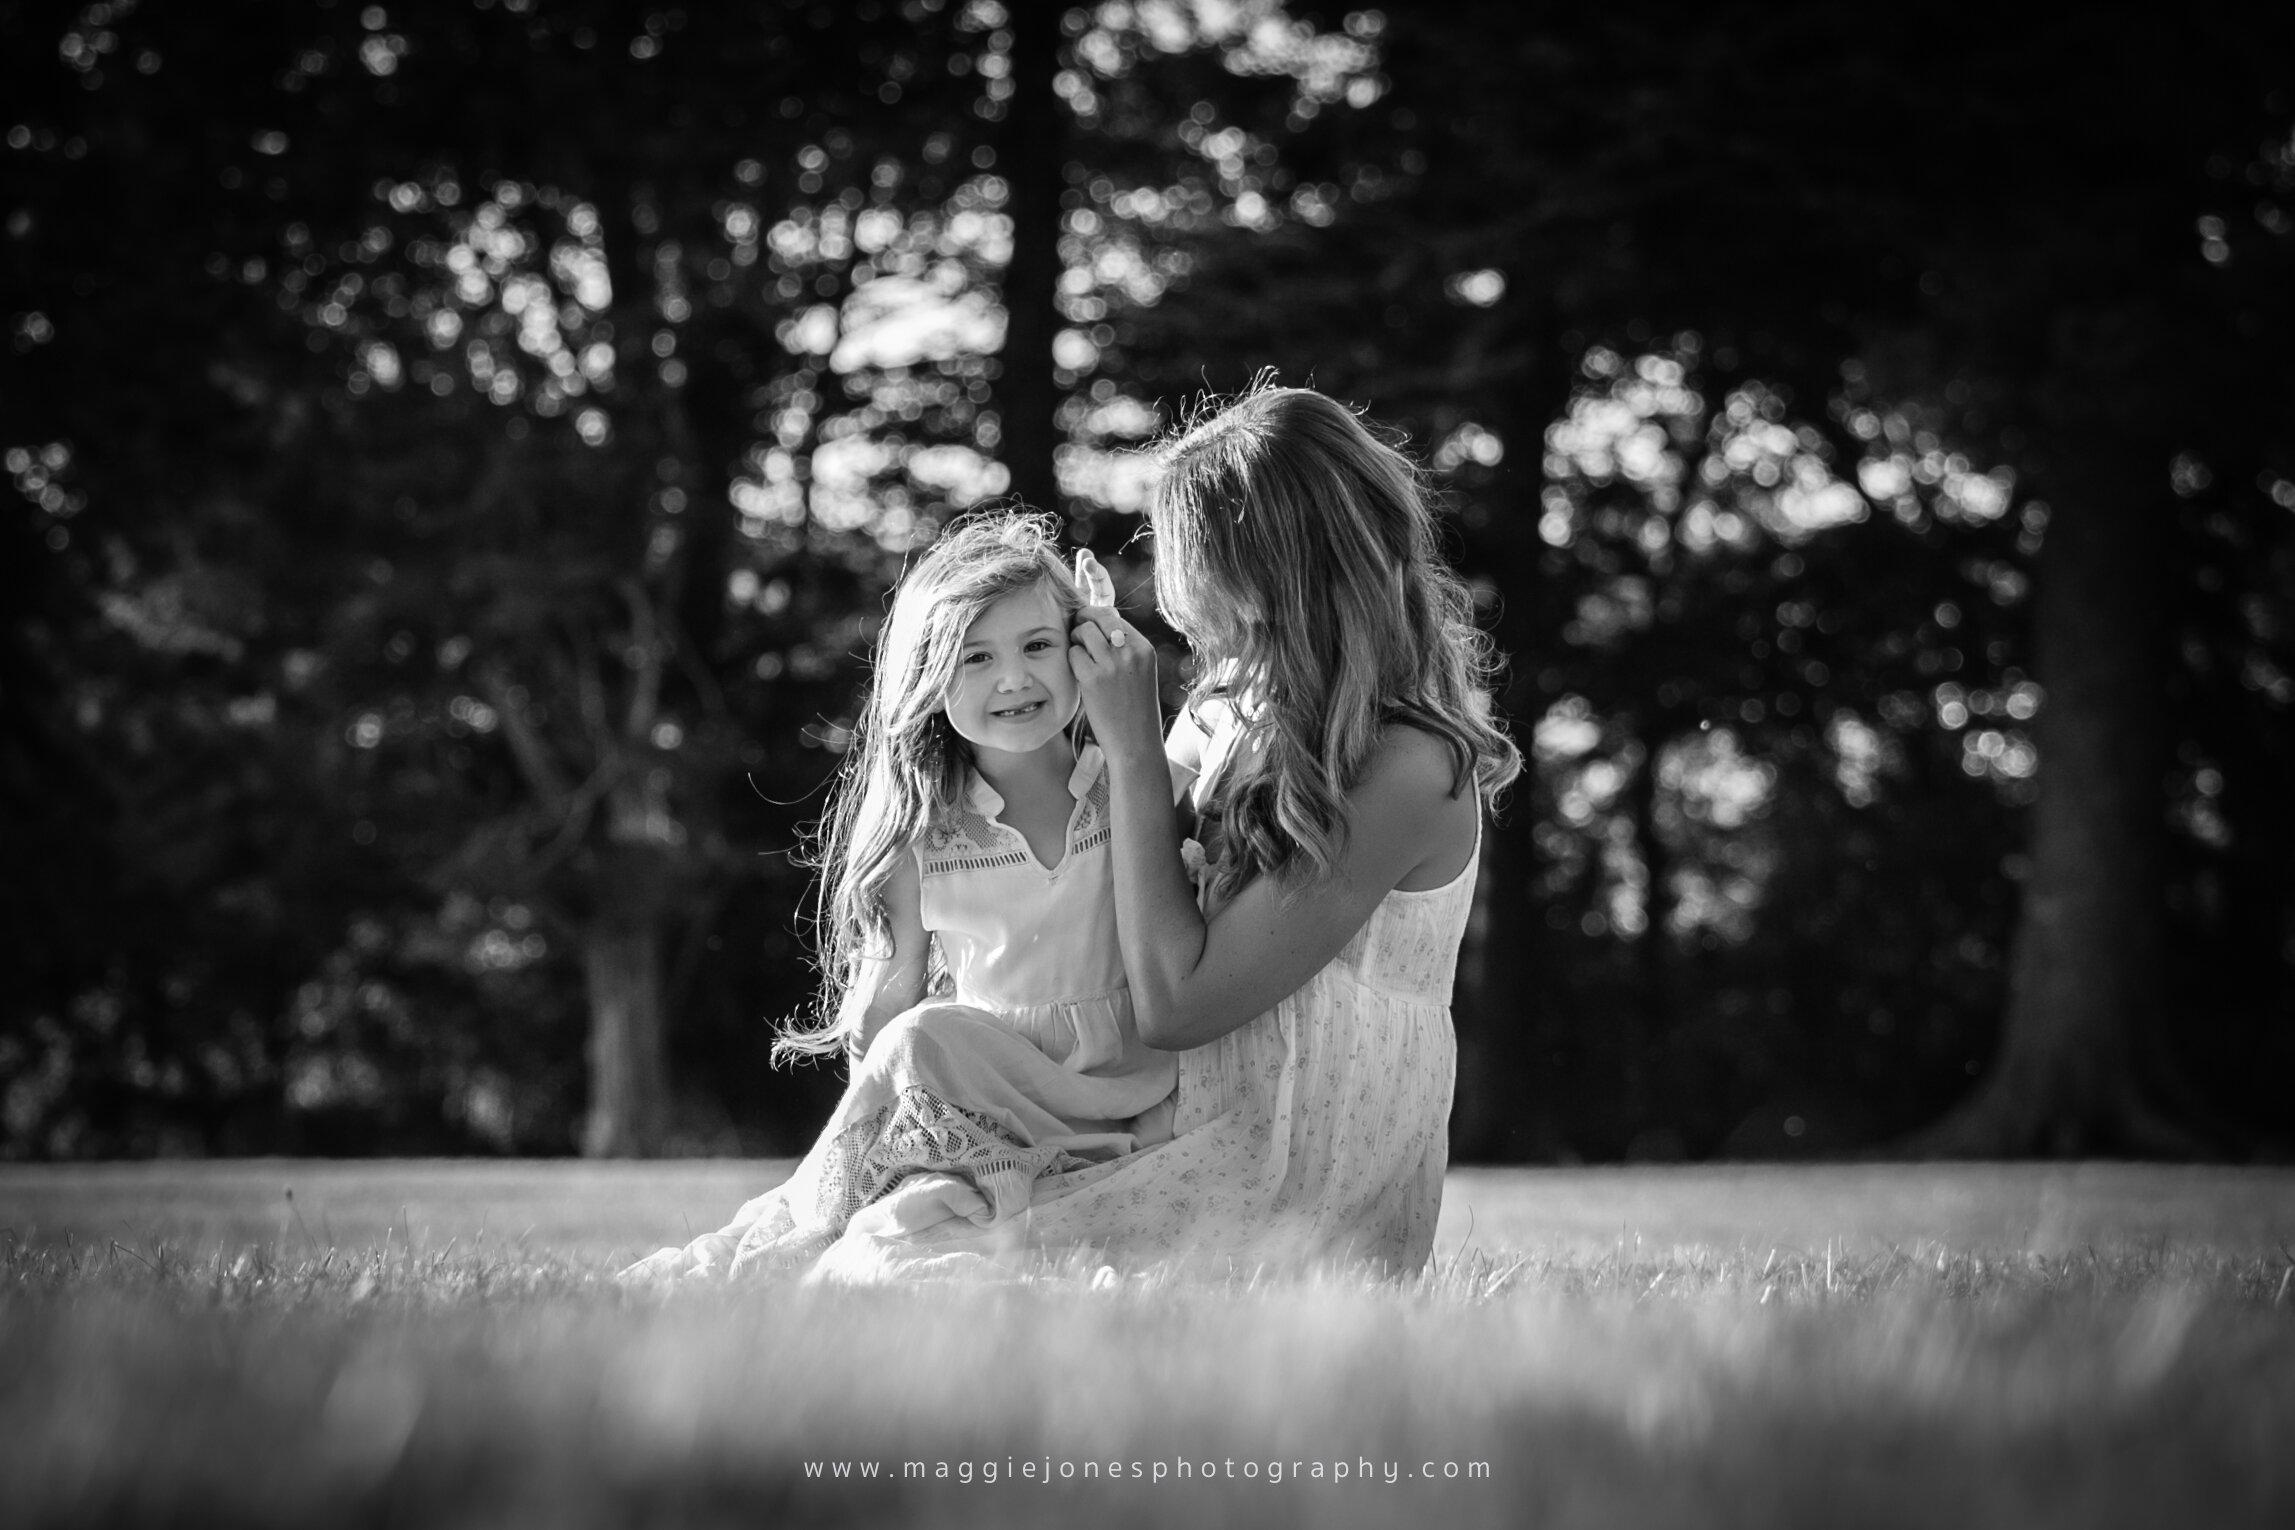 Lauren+Summer_BLOG-1-3.jpg